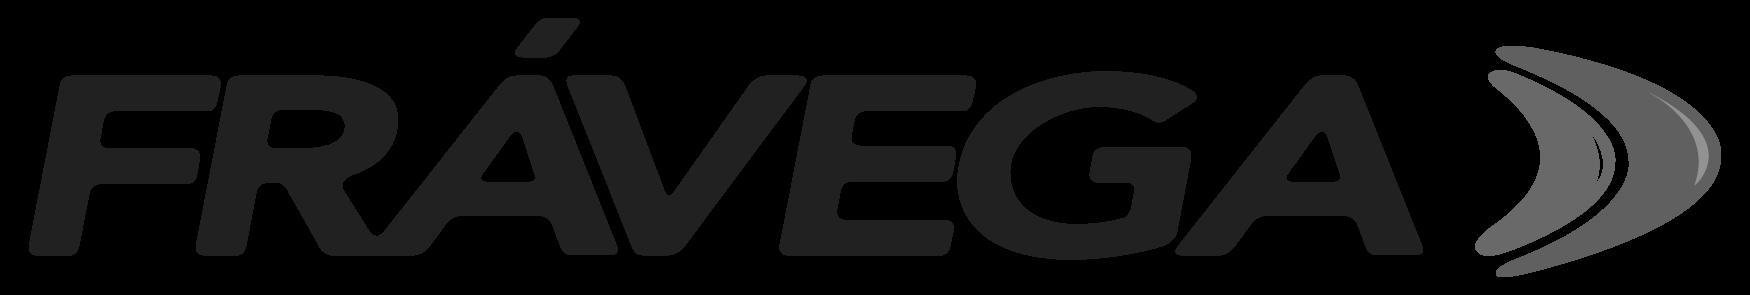 logo fravega